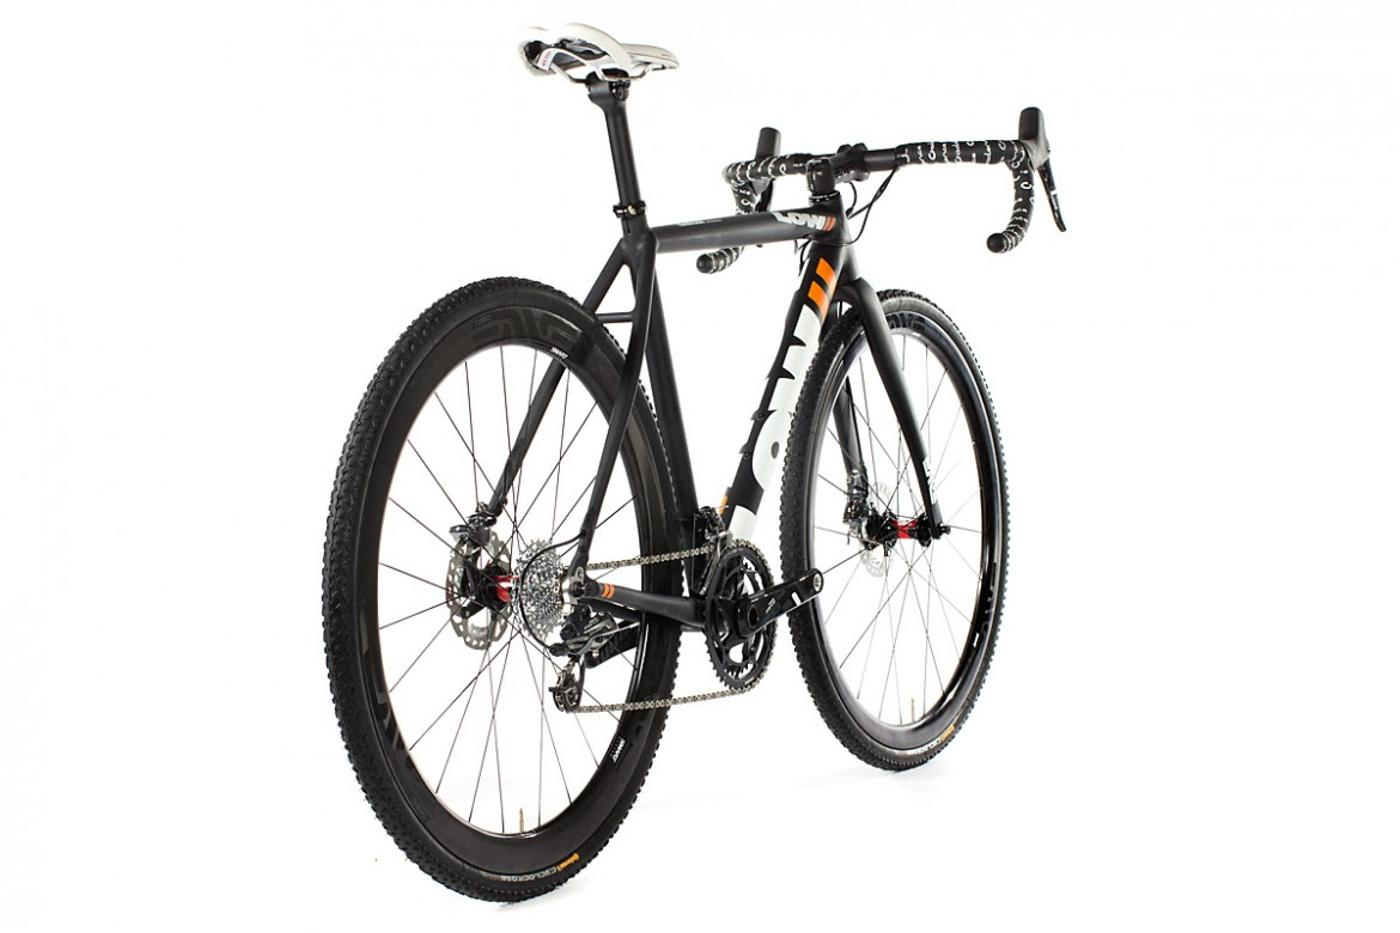 Low Bicycles CX Mkii Disc 'Cross Bike